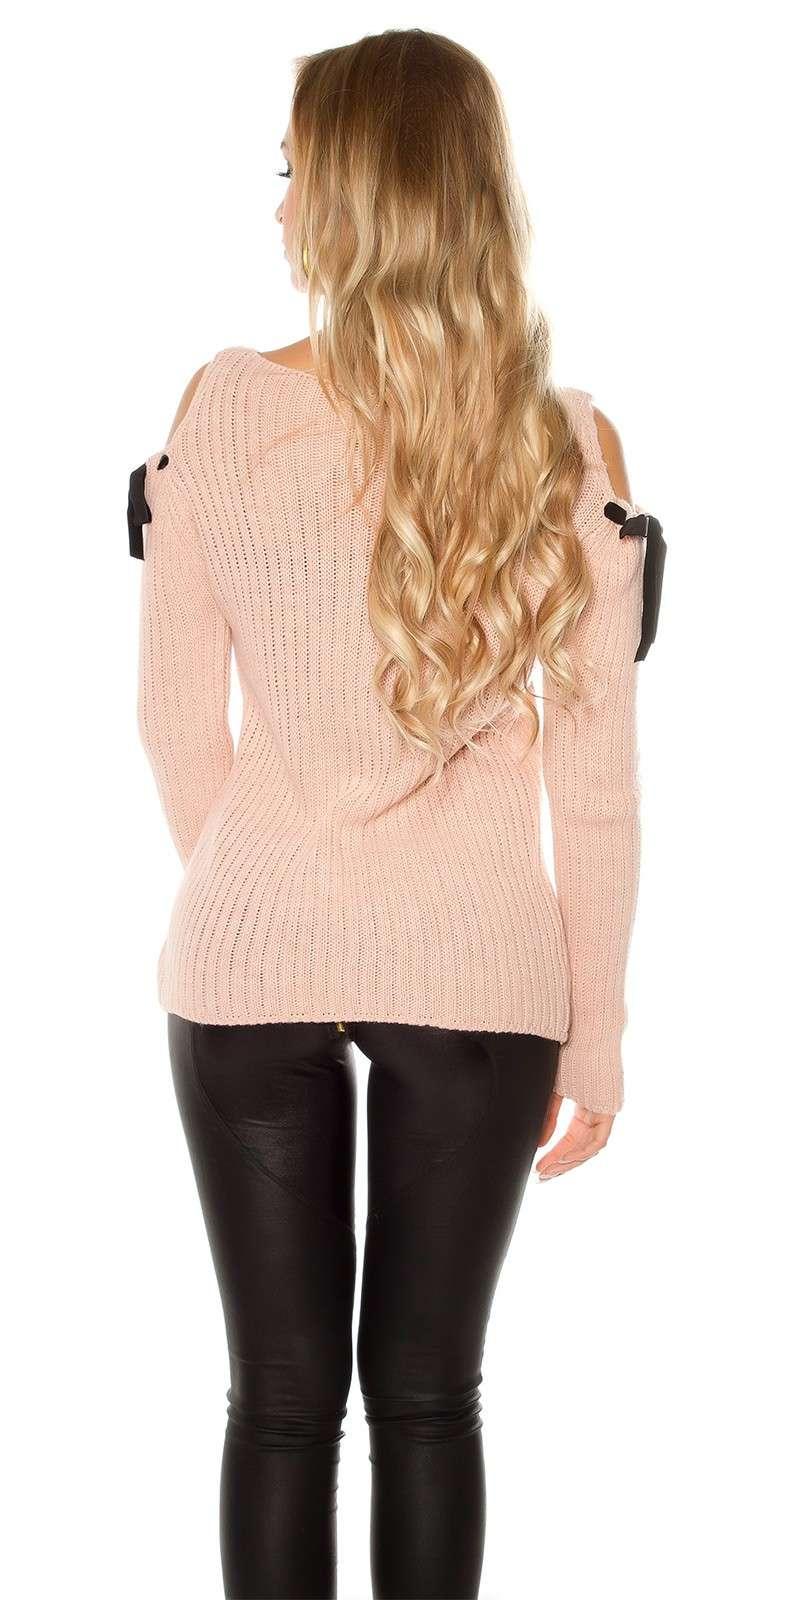 grobstrick pulli pullover sweatshirt altrosa. Black Bedroom Furniture Sets. Home Design Ideas